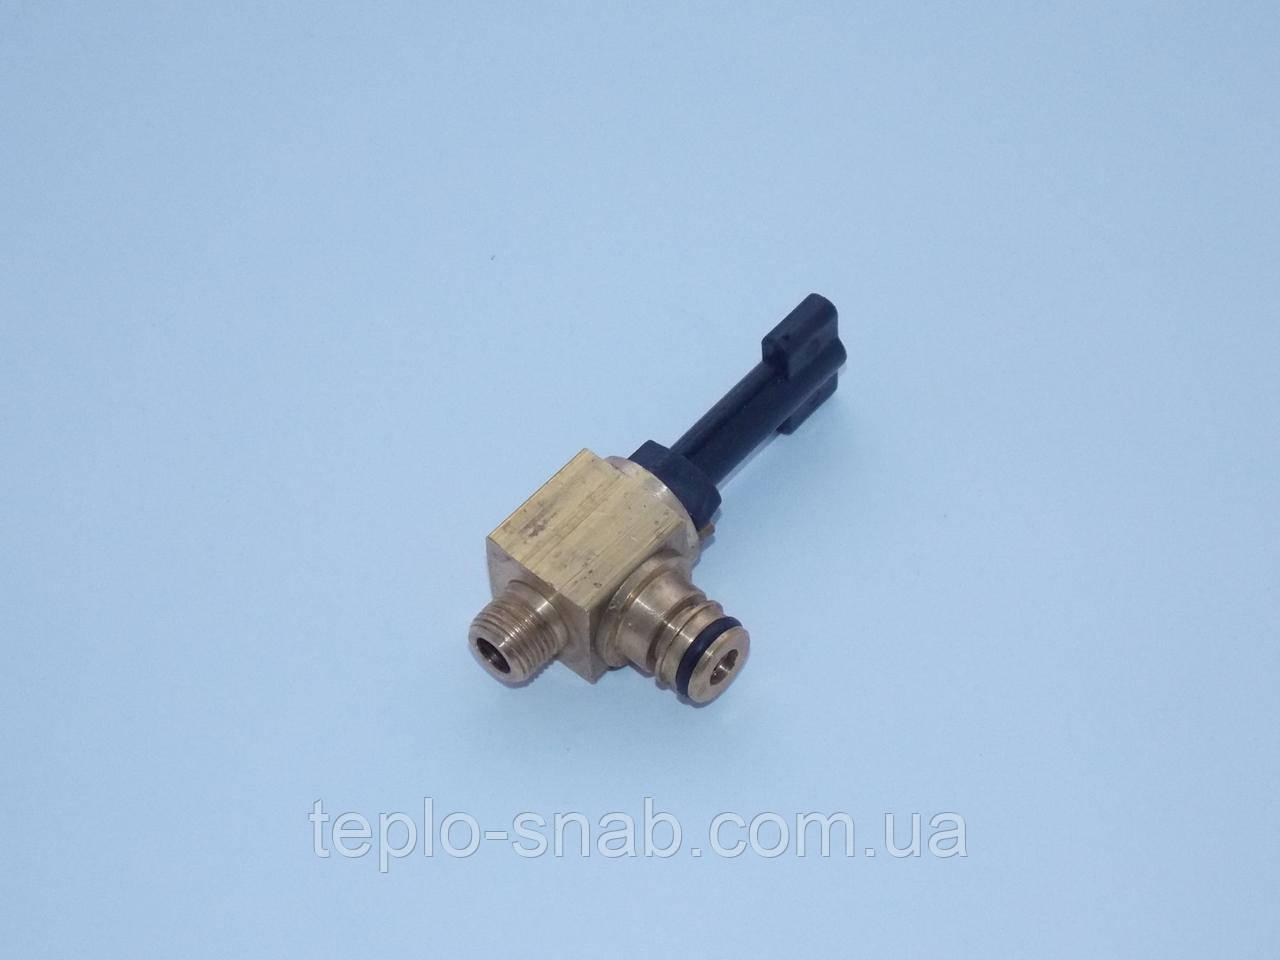 Кран подпитки Vaillant Atmo Tec Pro, Turbo Tec Pro. 0020018065. Protherm Panther v18. 0020038130